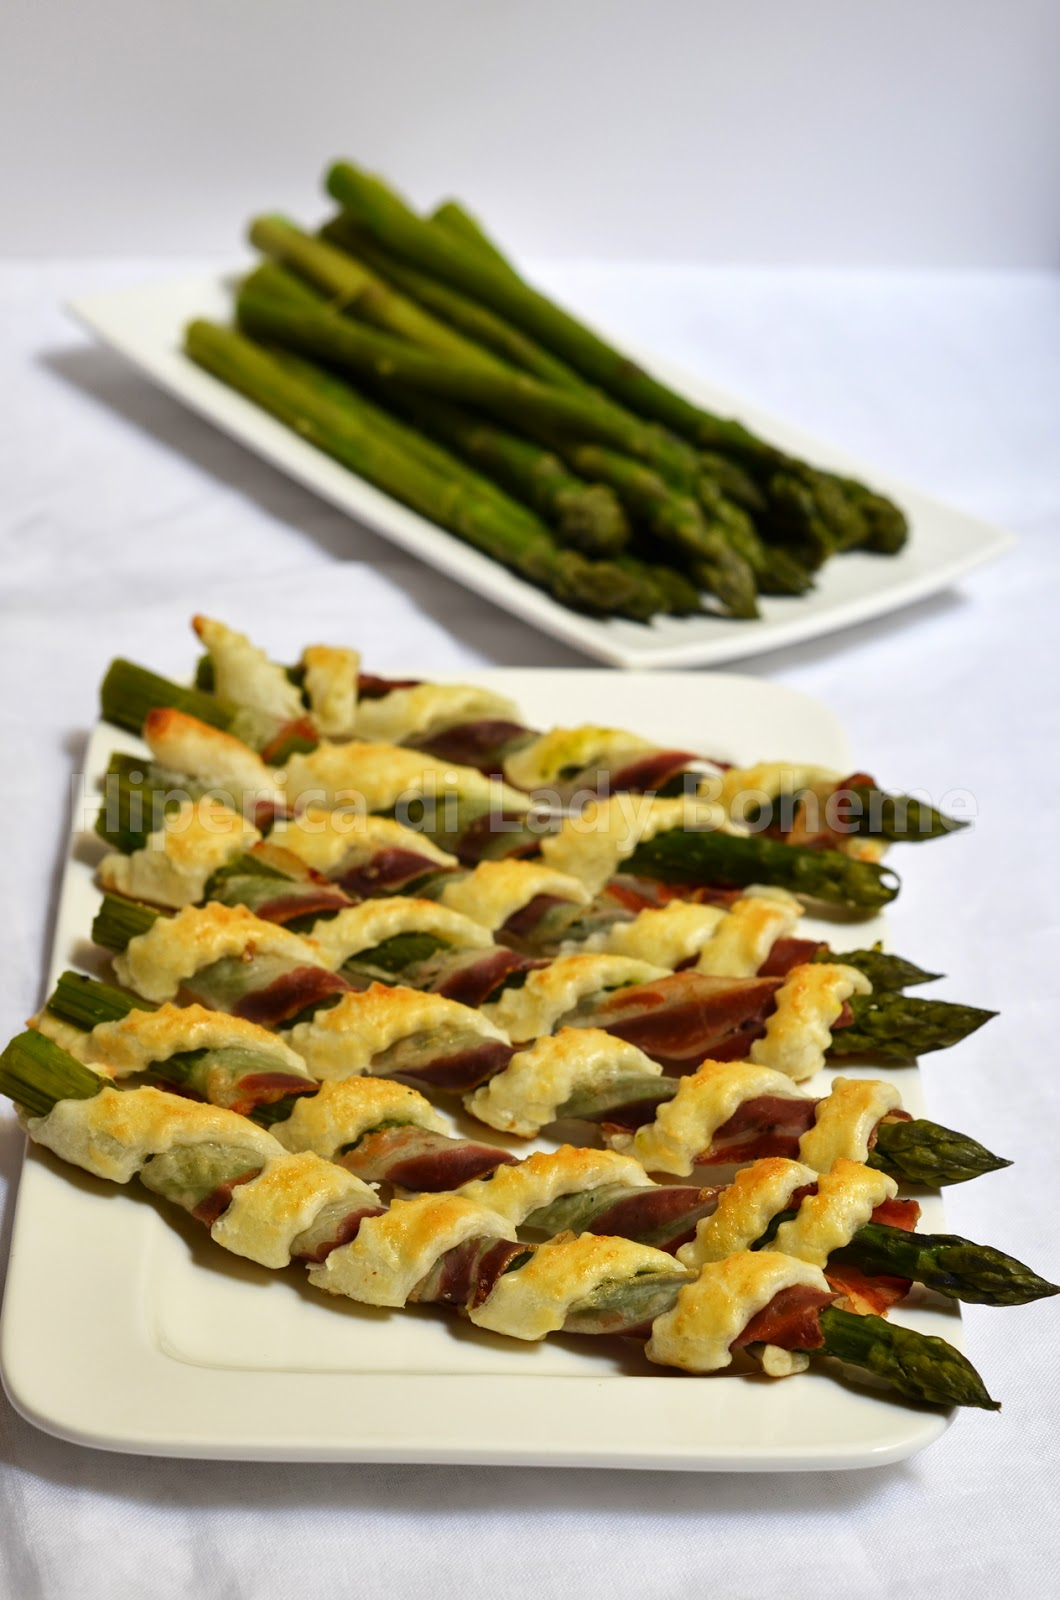 hiperica_lady_boheme_blog_cucina_ricette_gustose_facili_veloci_cannoli_di_pasta_sfoglia_con_asparagi_e_pancetta_1